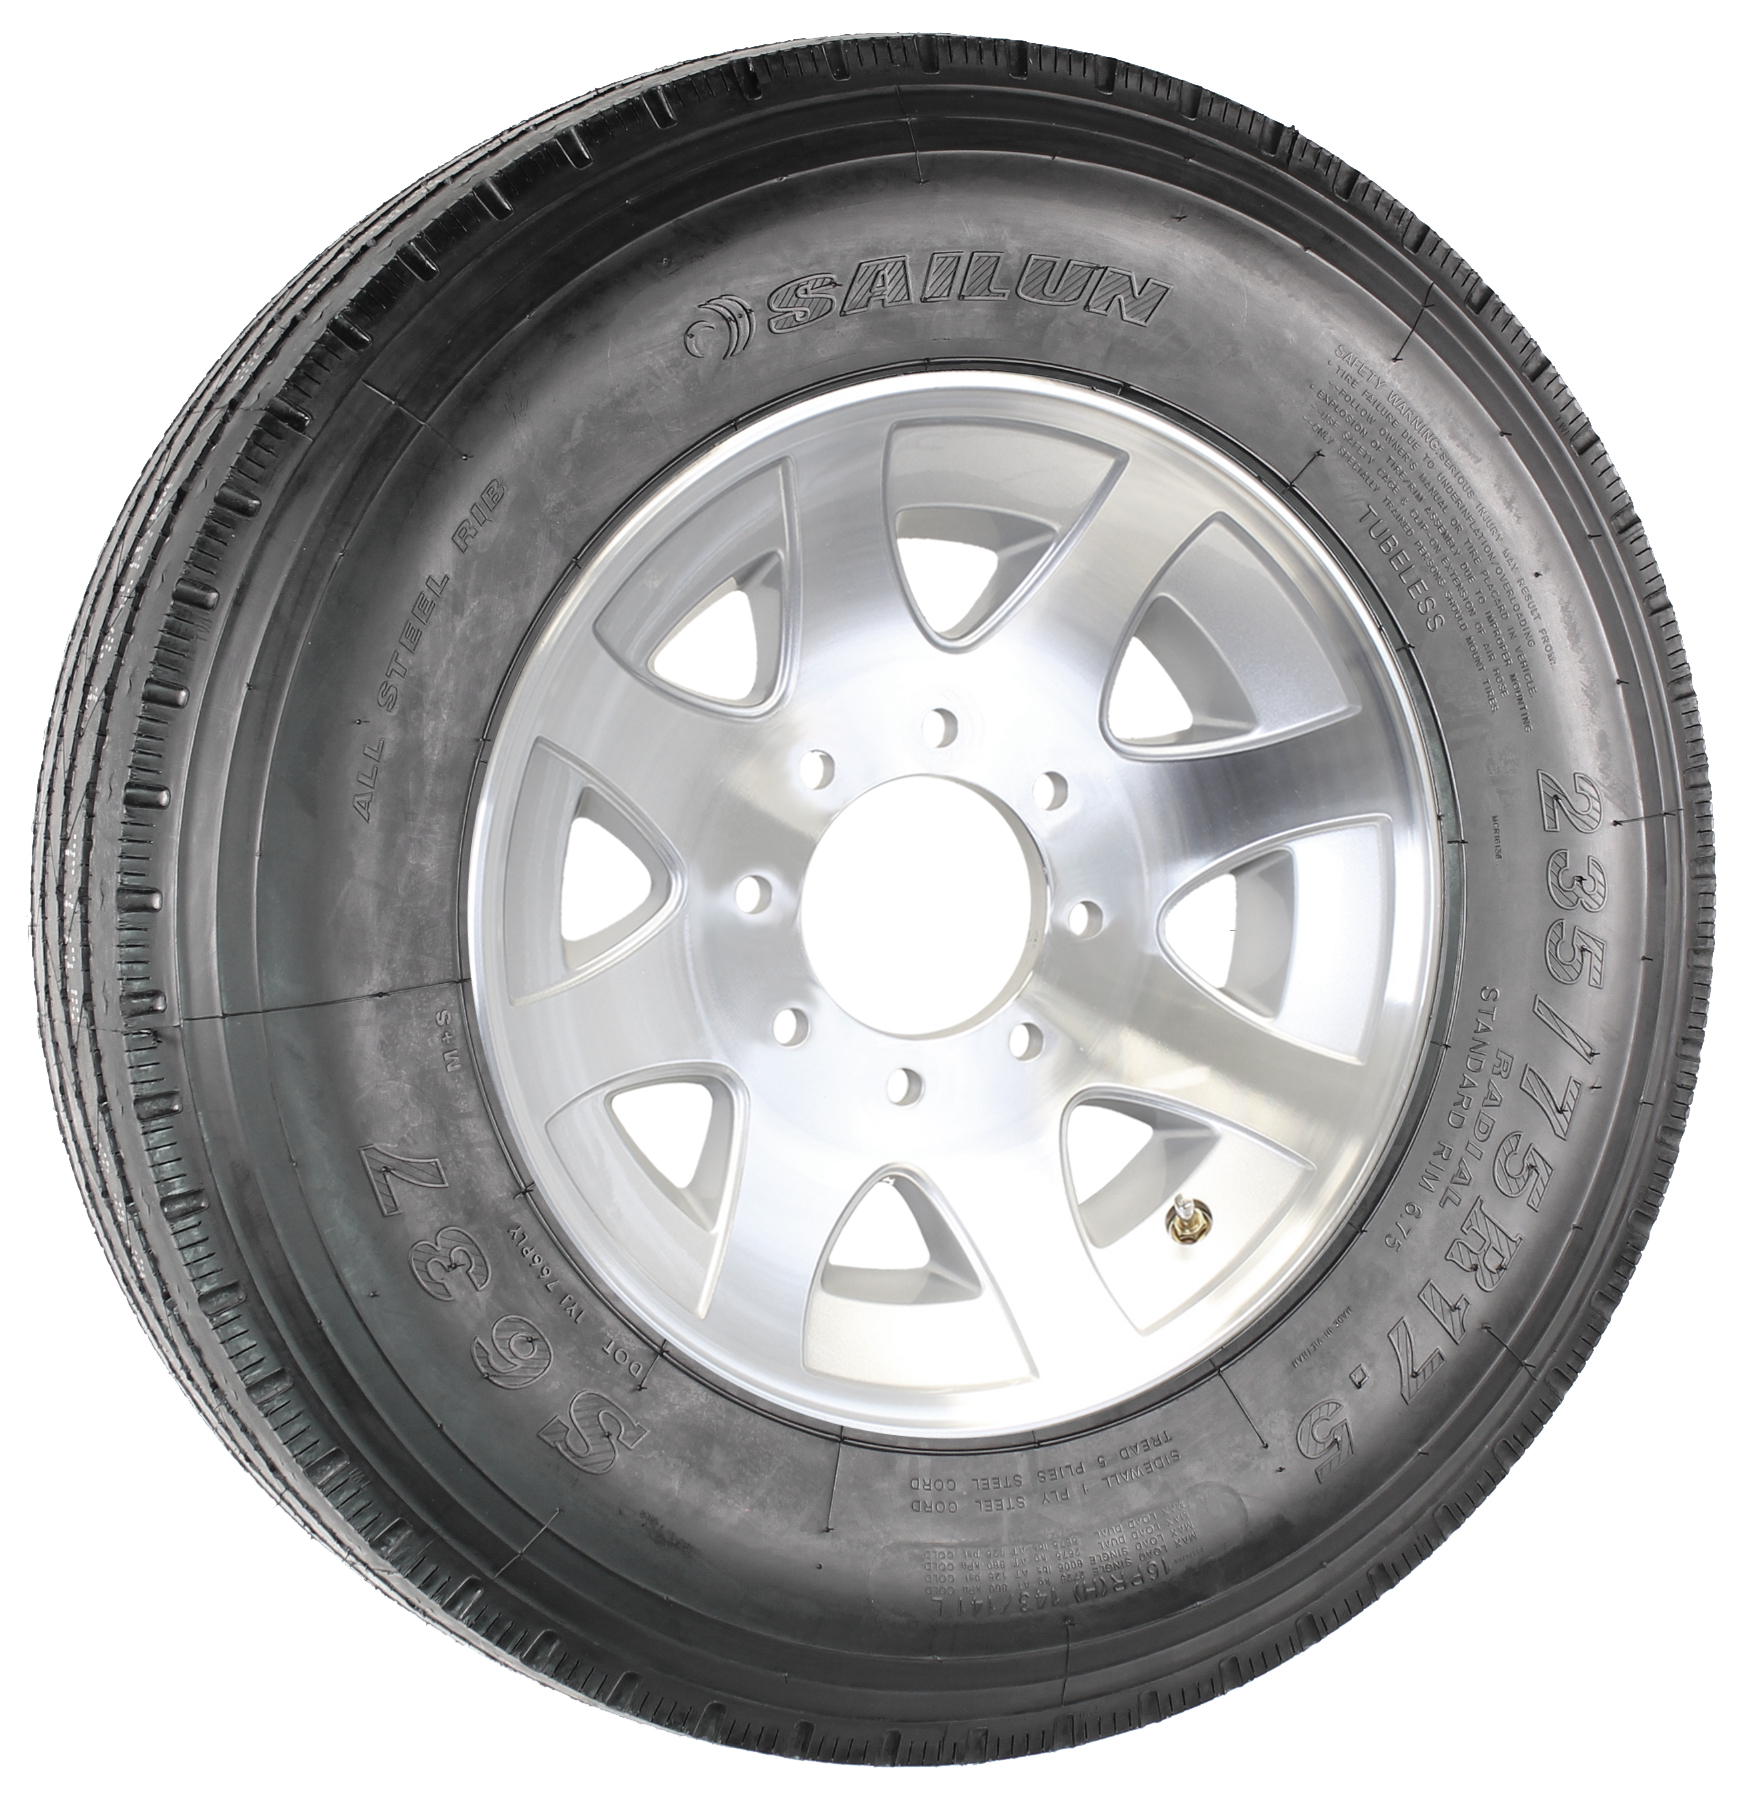 "Sailun 235/75R17.5 LRH Radial Tire on 17.5"" 8-Lug YF Aluminum Spoke Assembly Image"